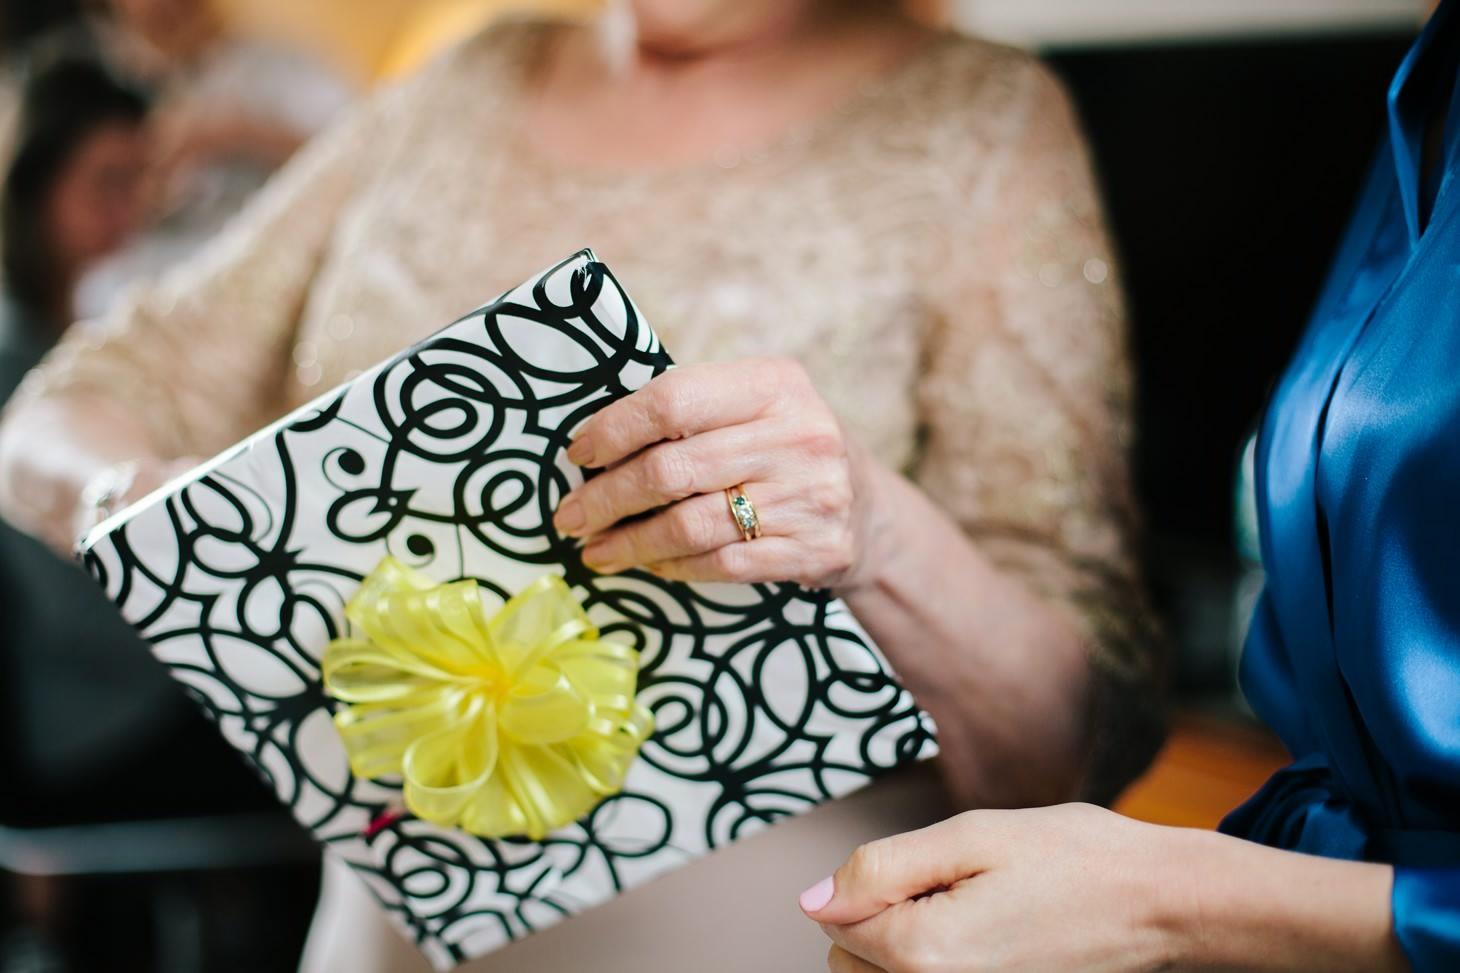 008-nyc-wedding-photographer-brooklyn-restaurant.jpg